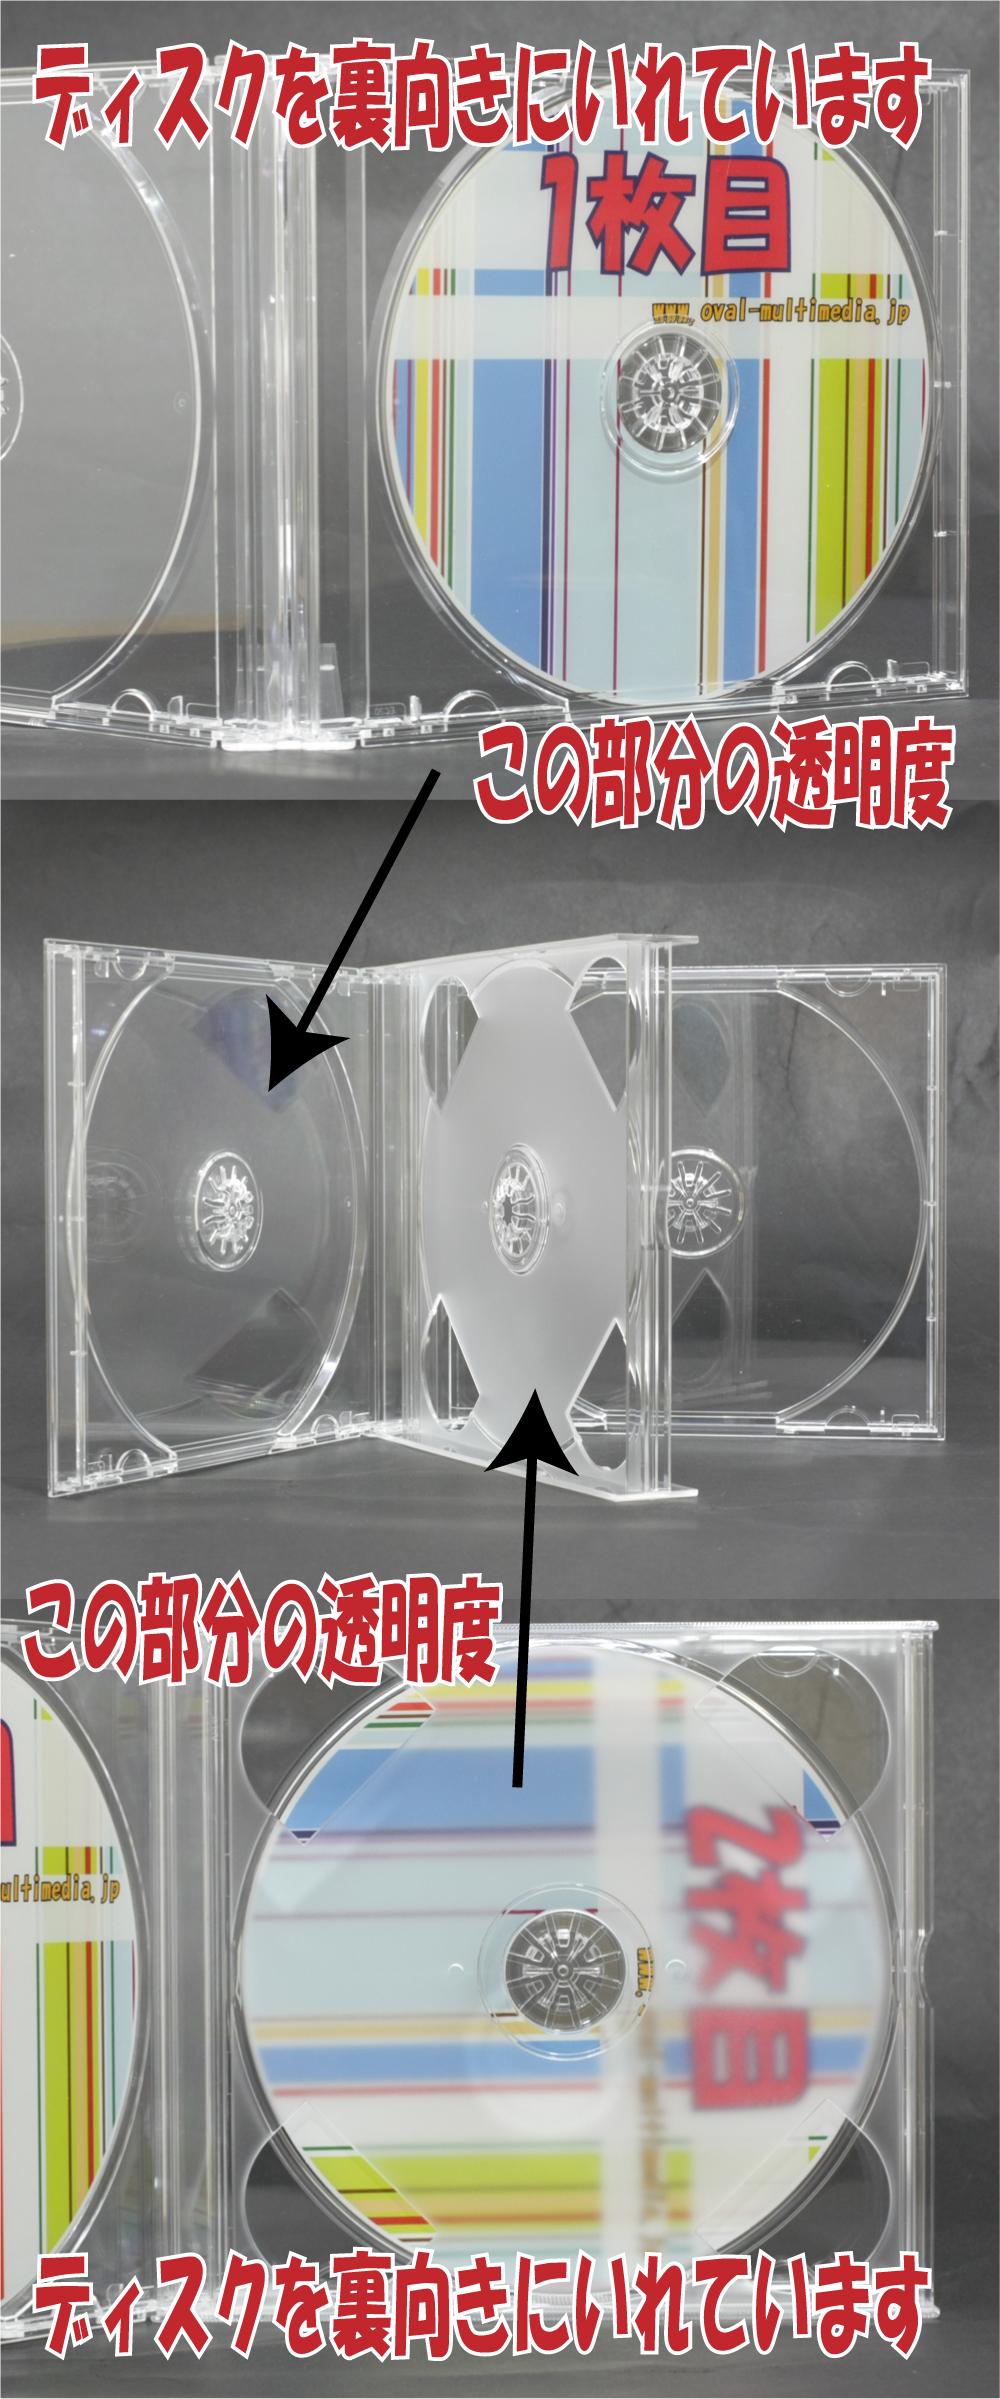 24mm厚日本製ジュエルケース 4枚収納